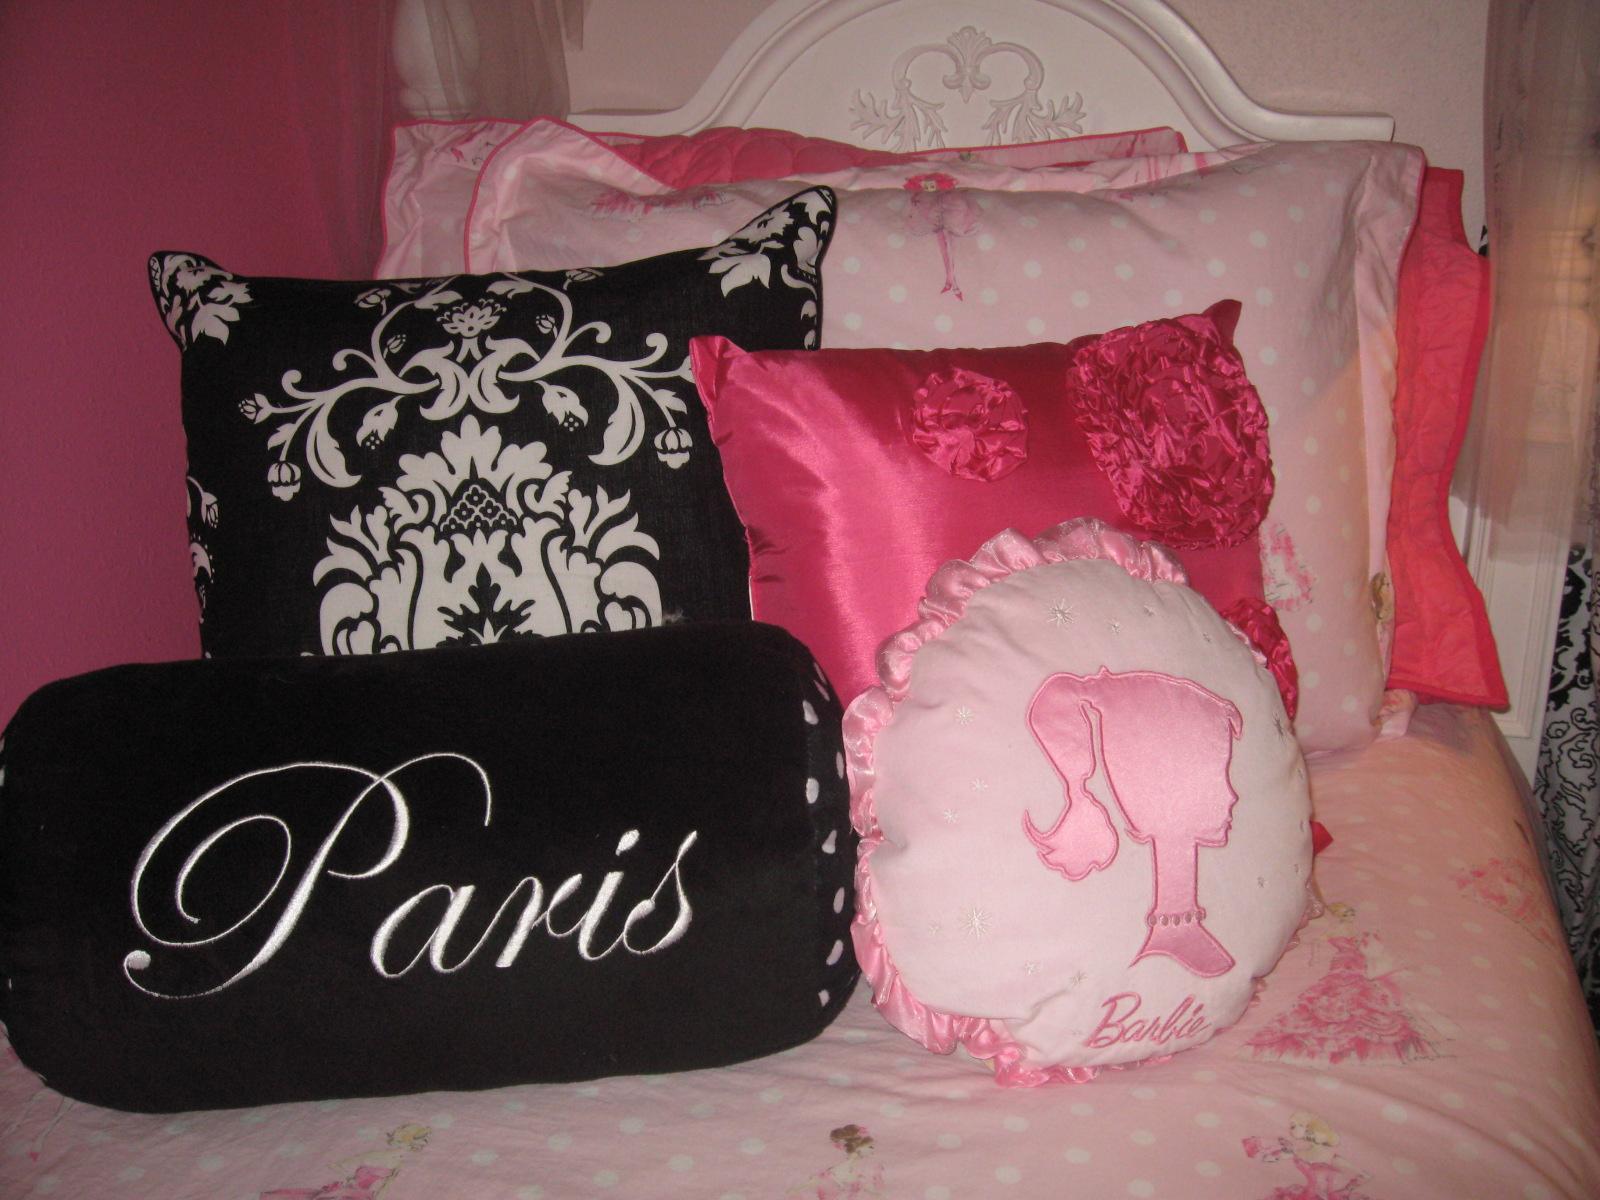 Pottery Barn Kids Doll High Chair Sheepskin Covers Nz Vintage Barbie Parisian Room - Design Dazzle